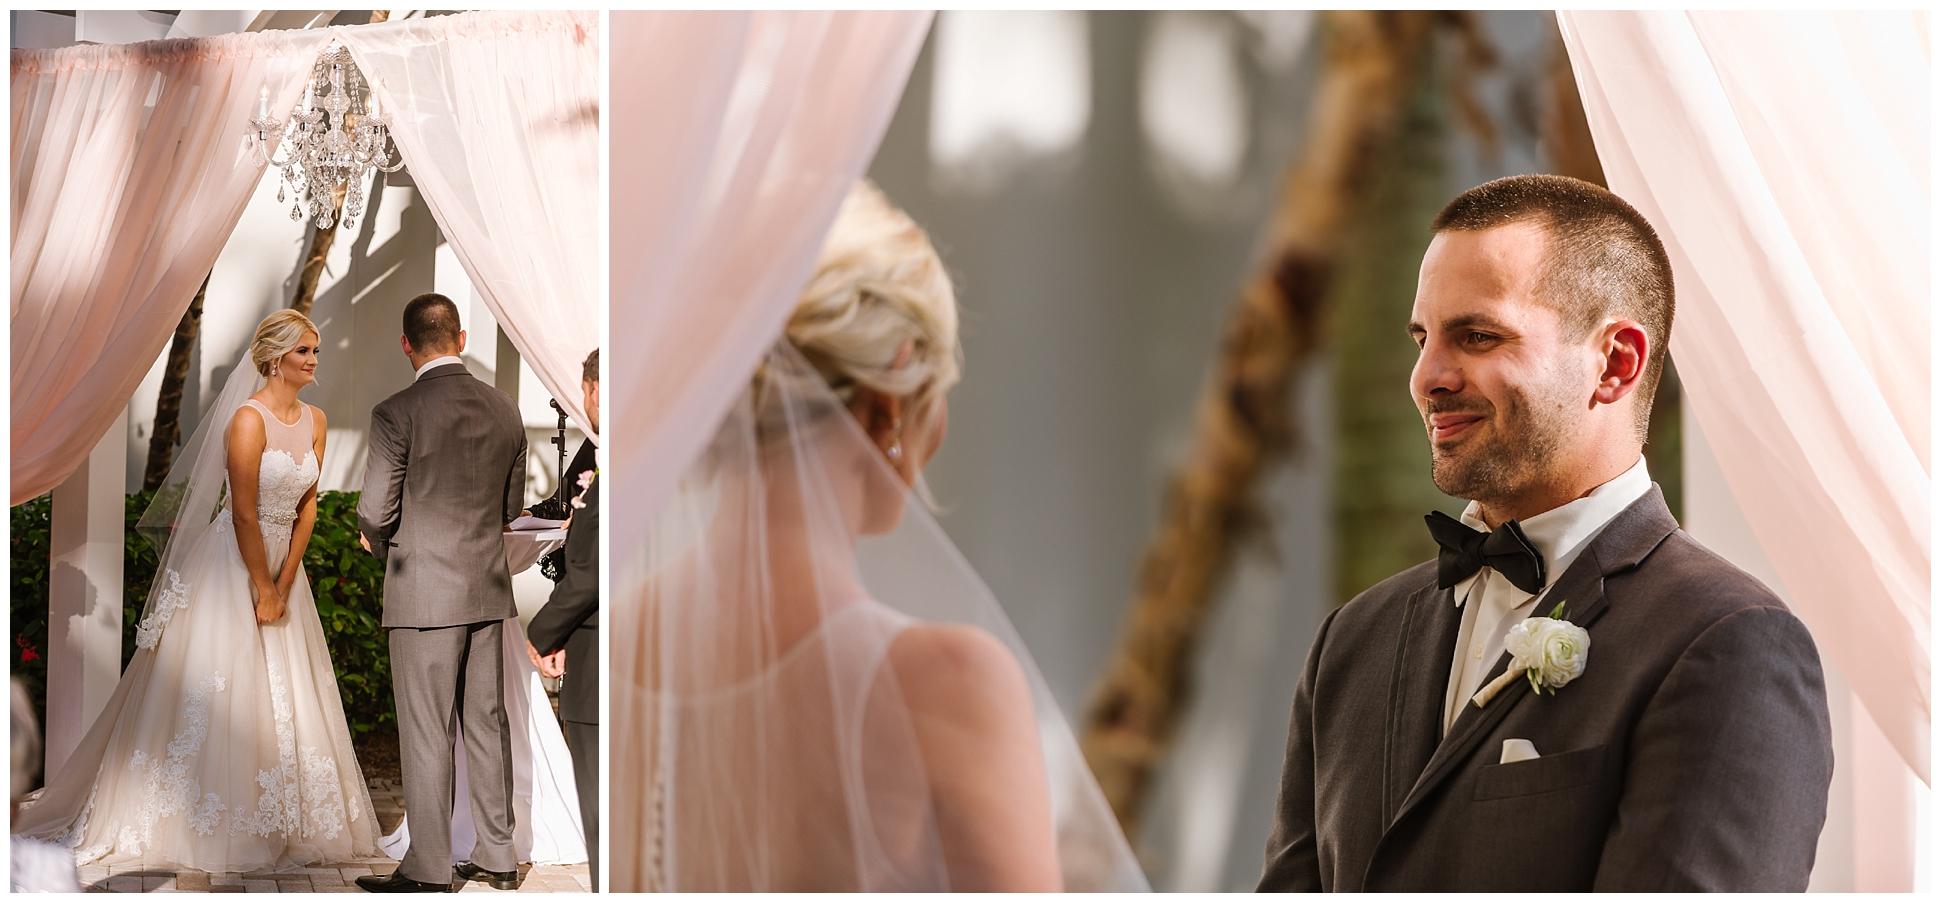 Sarasota-wedding-photographer-hyatt-regency-blush_0039.jpg